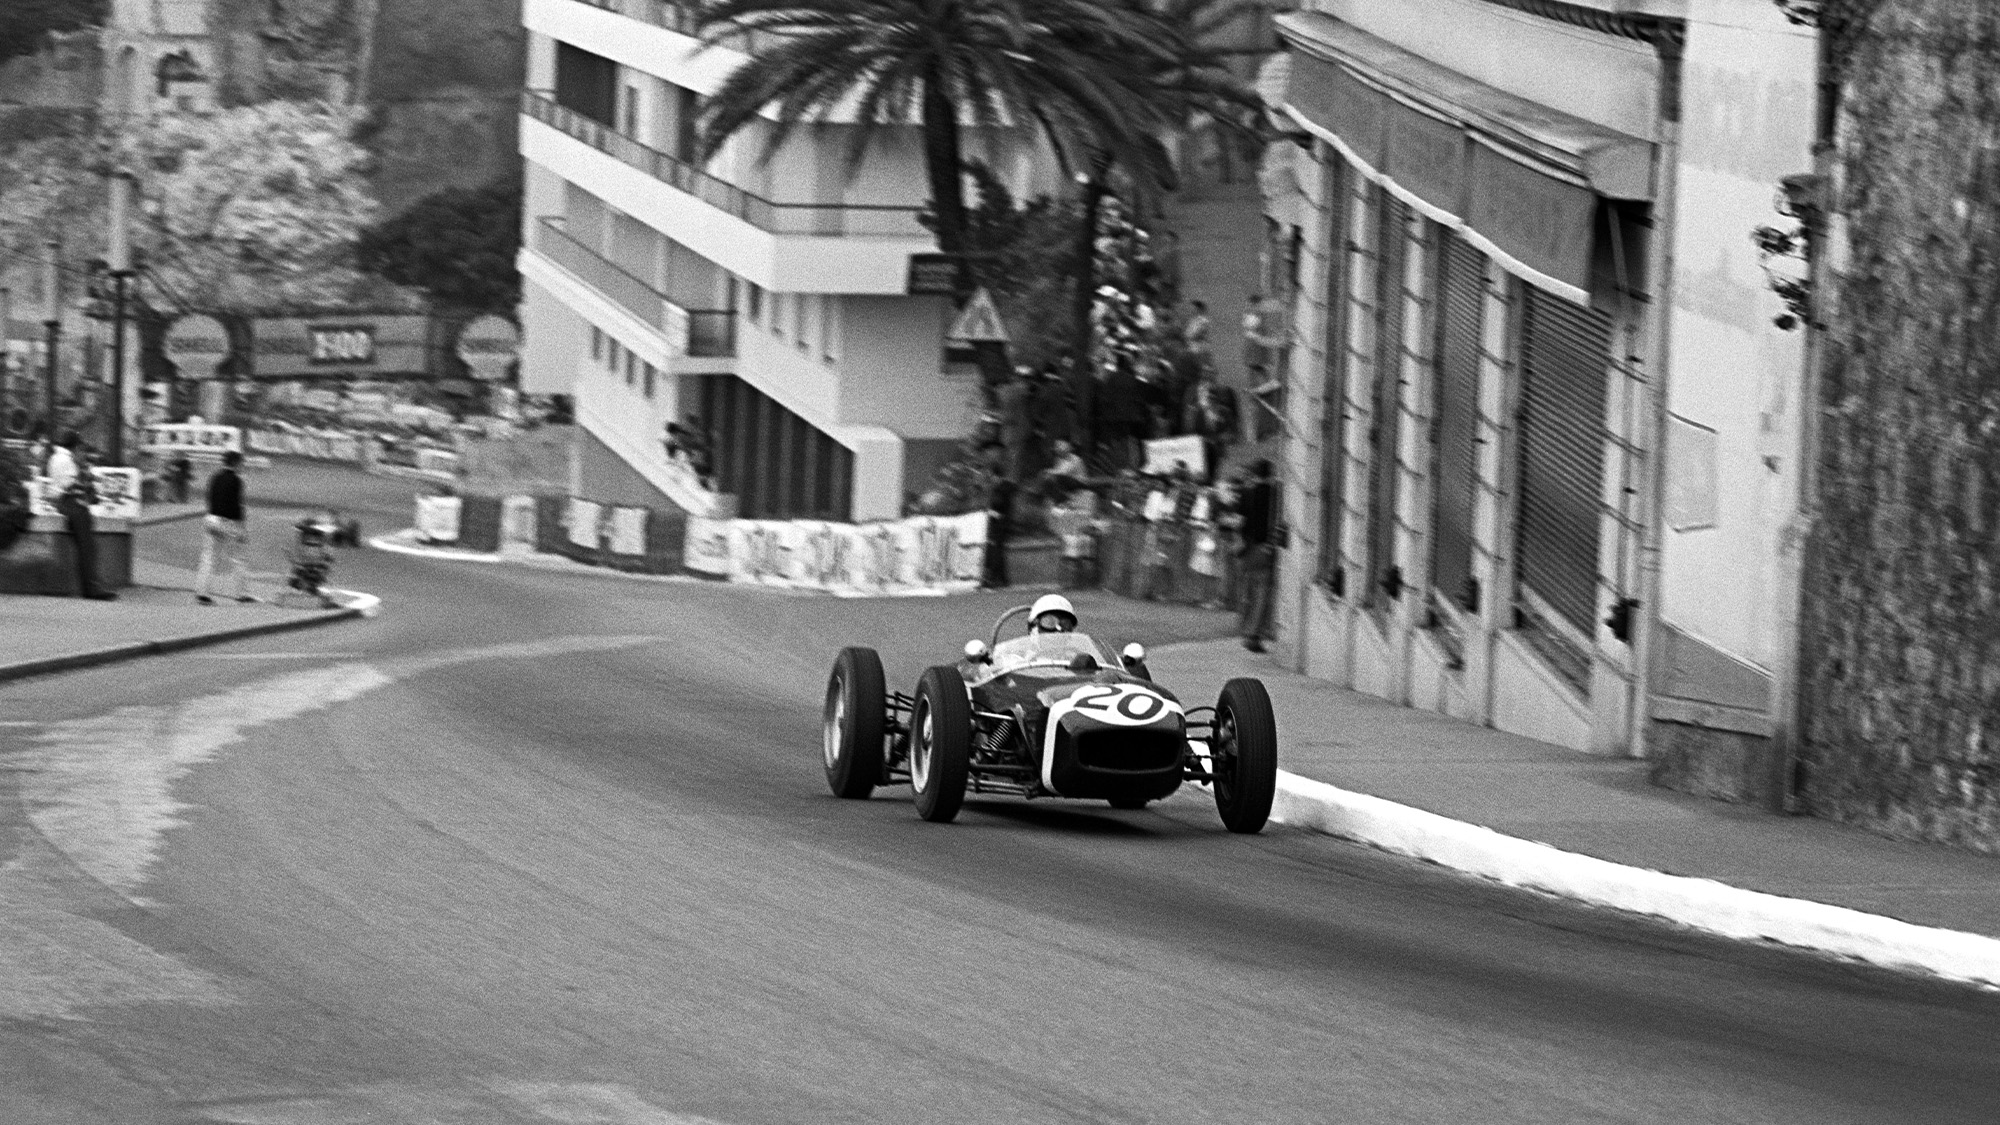 Stirling Moss climbs the hill from Ste Devote in the 1961 Monaco Grand Prix